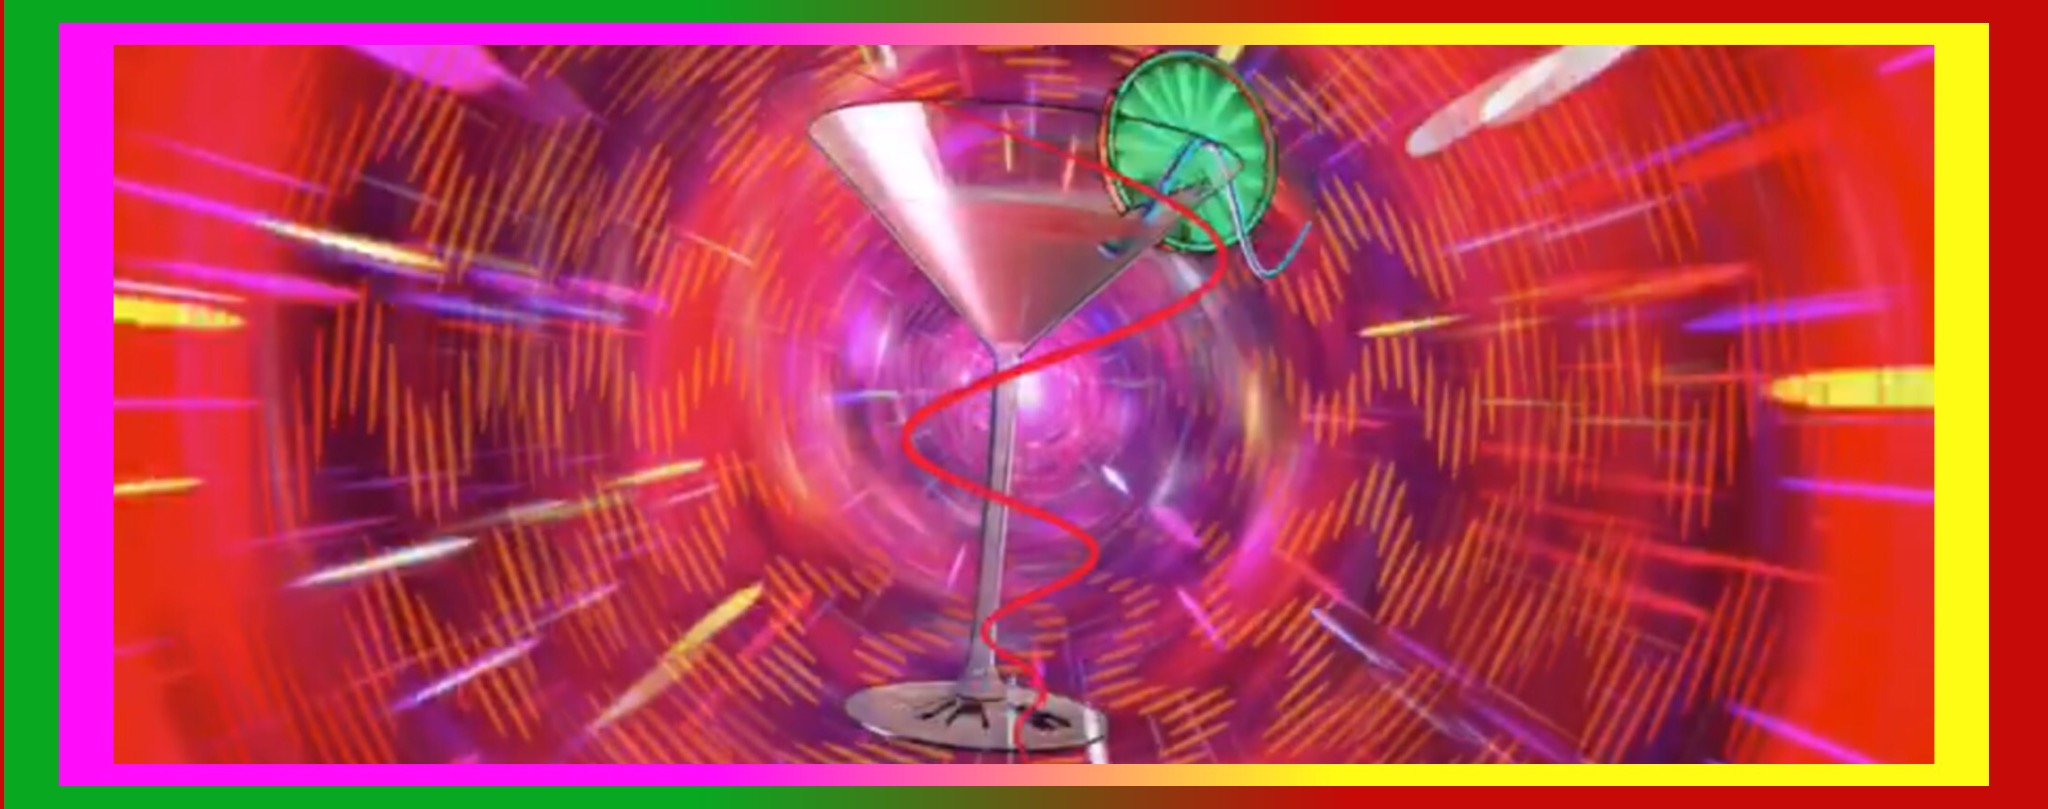 martini-vision-thumbnail.JPG